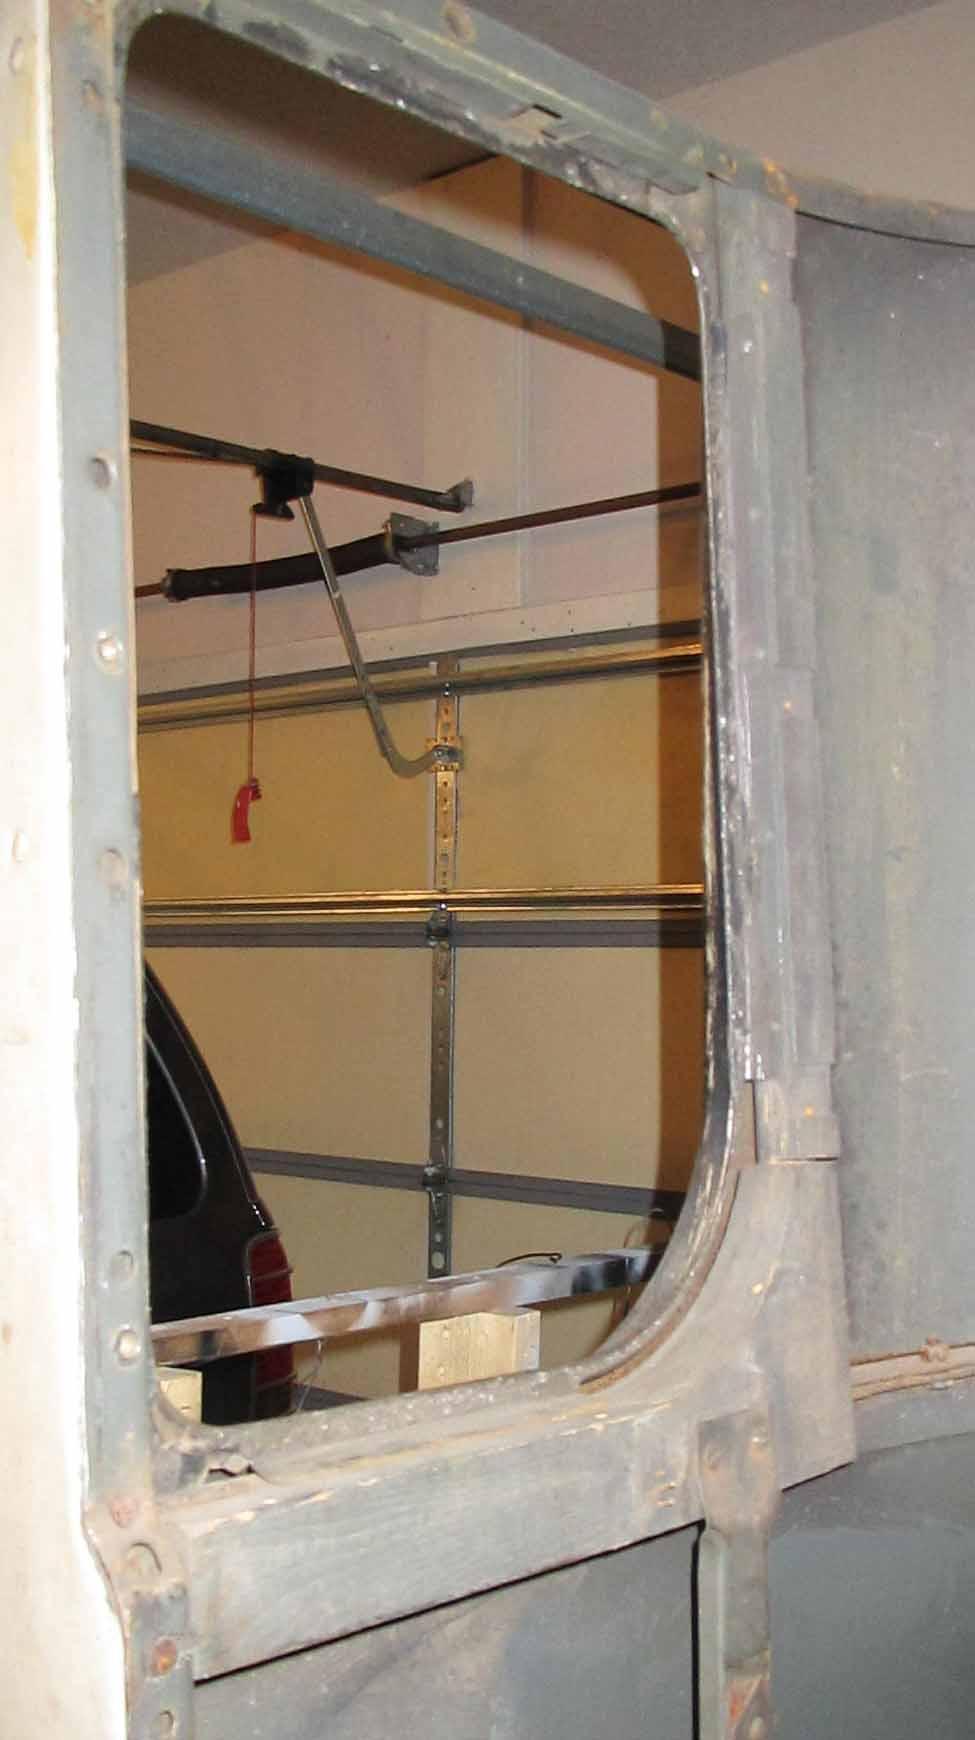 Quarter panel window frame